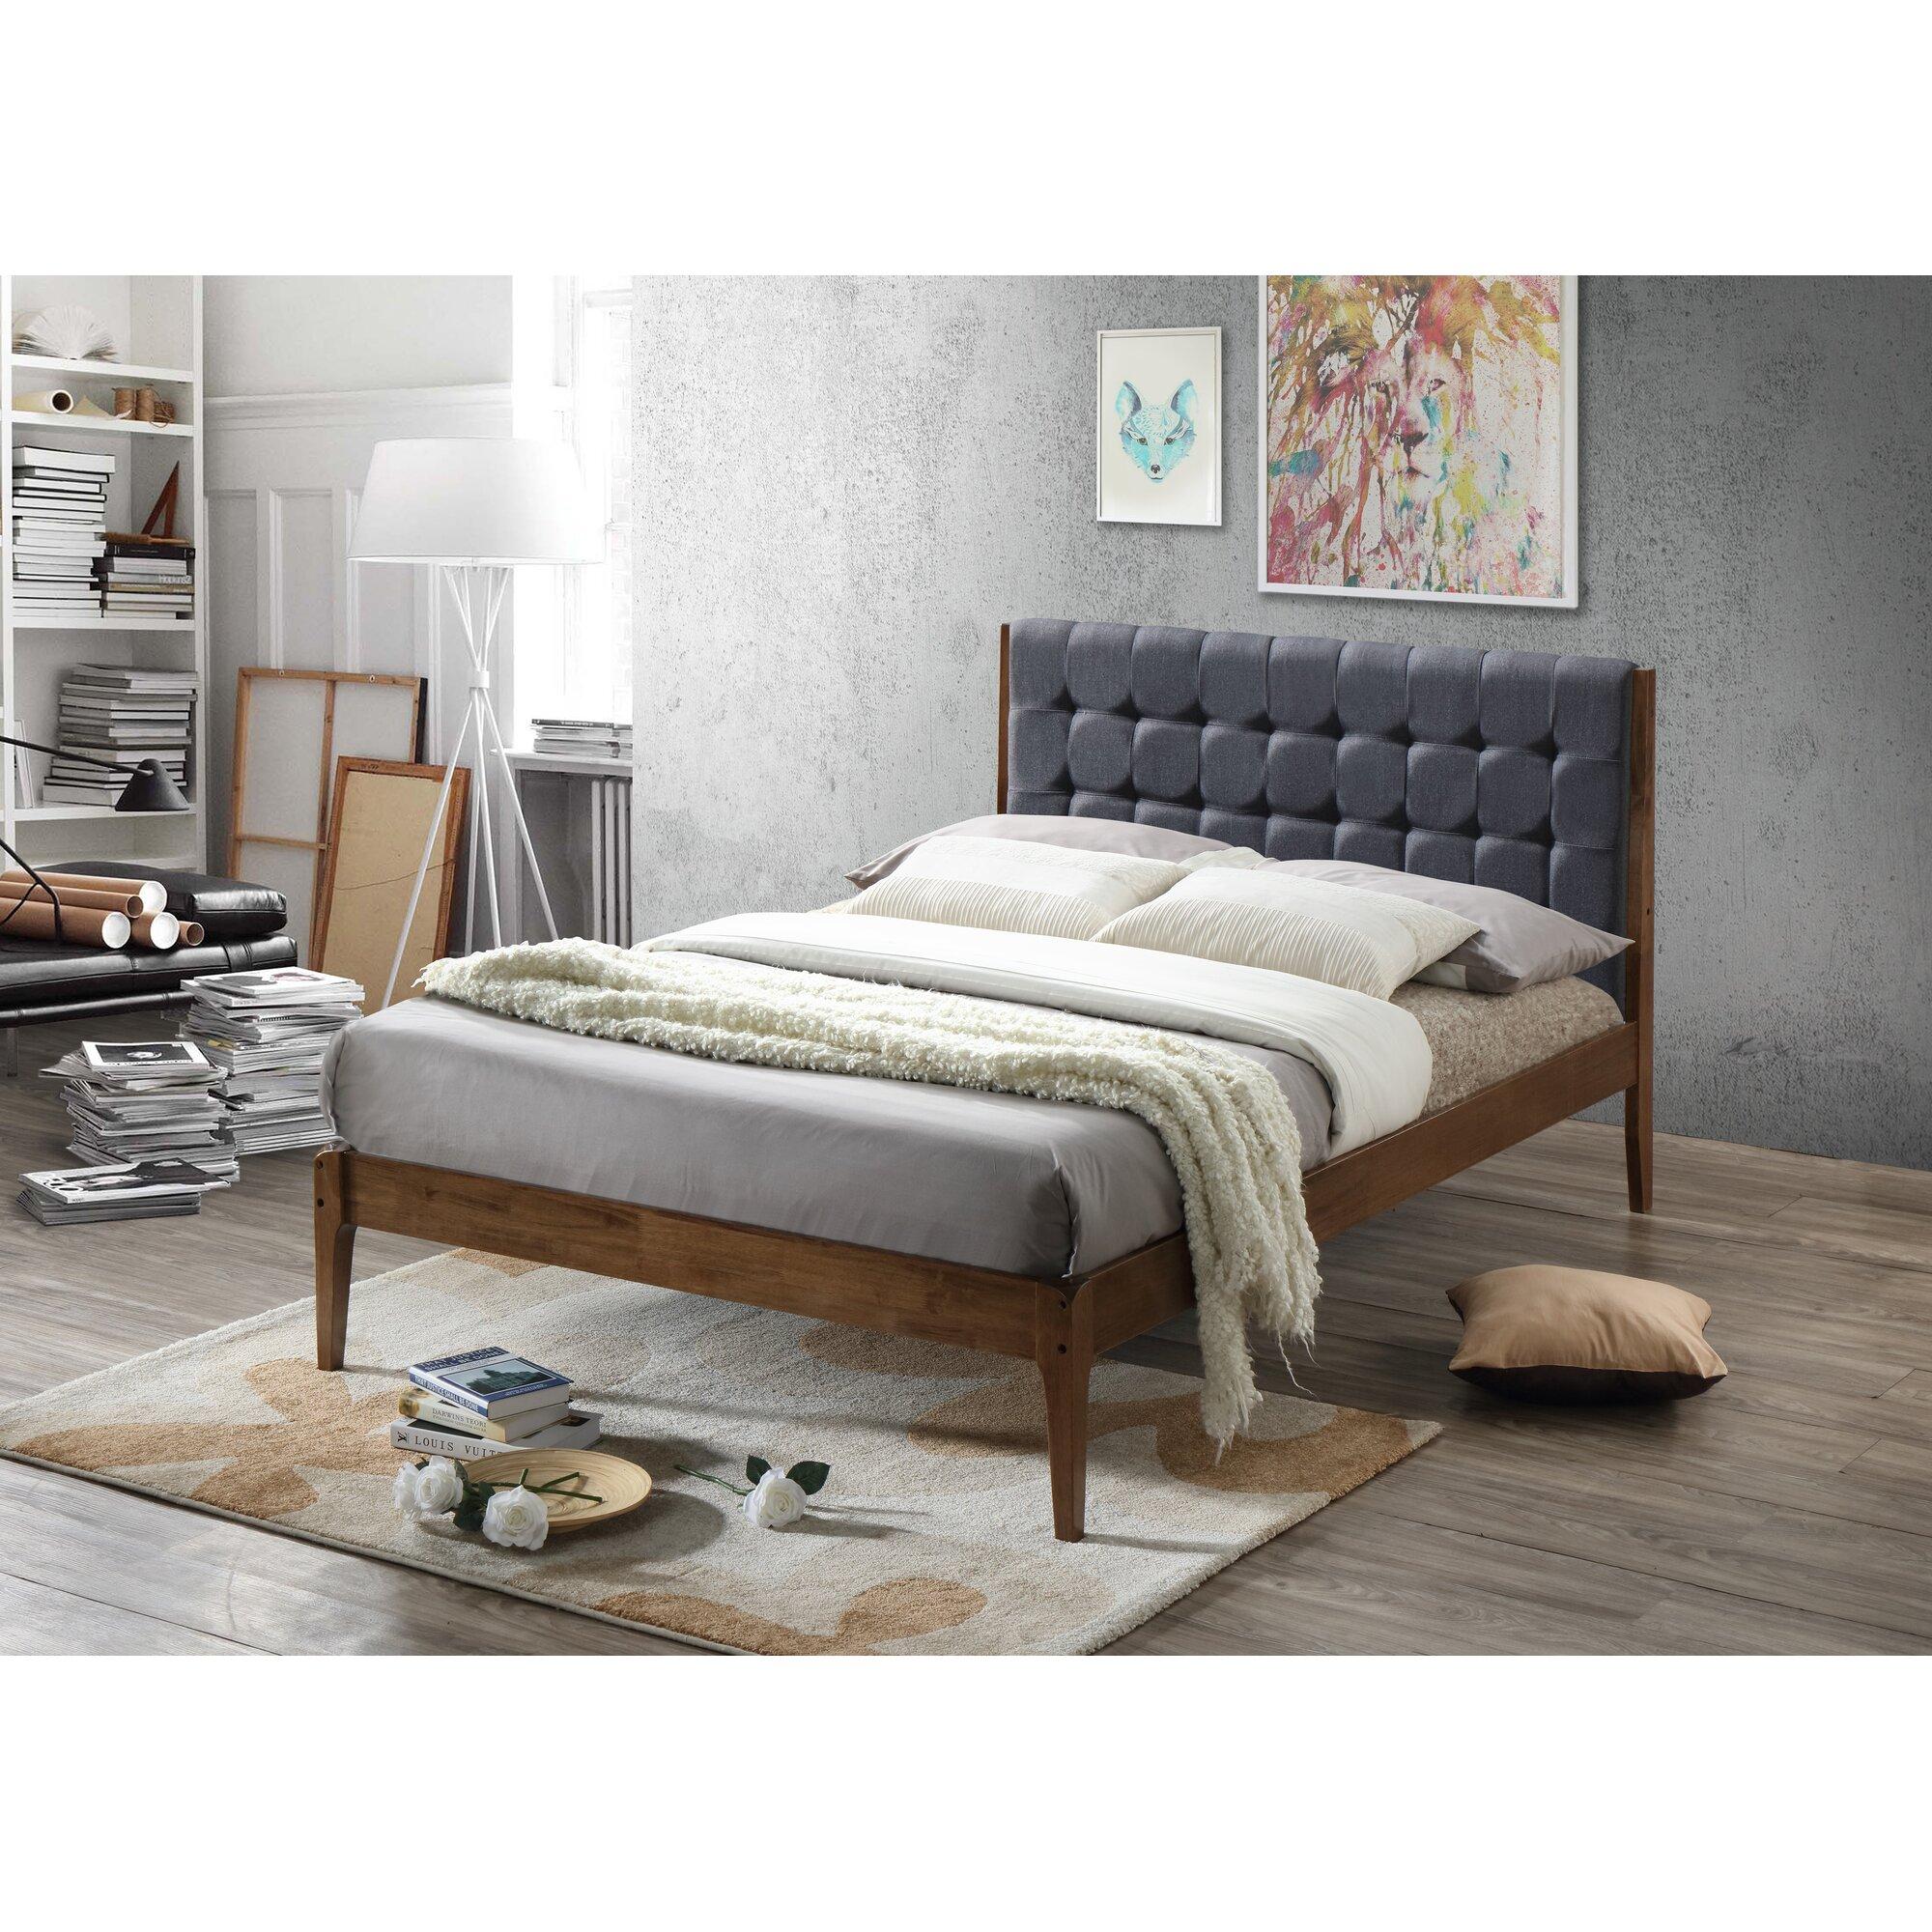 baxton studio clemente wood platform bed